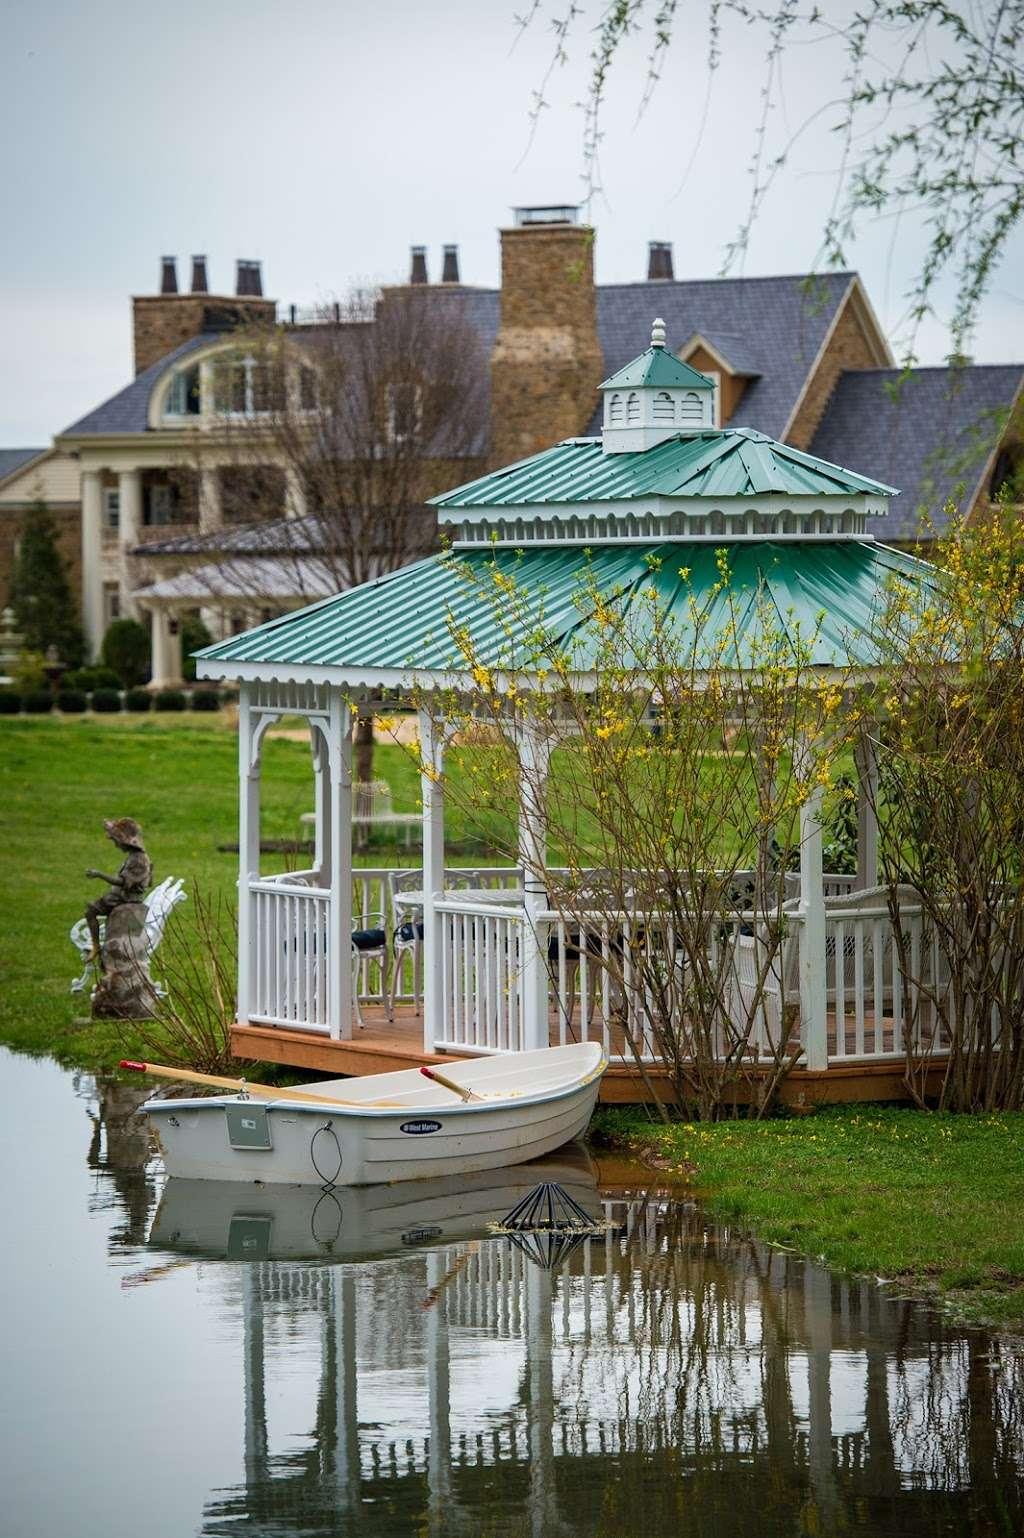 Muchas Uvas Winery - travel agency    Photo 4 of 10   Address: 116 High Meadow Manor LN, Flint Hill, VA 22627, USA   Phone: (202) 258-7095